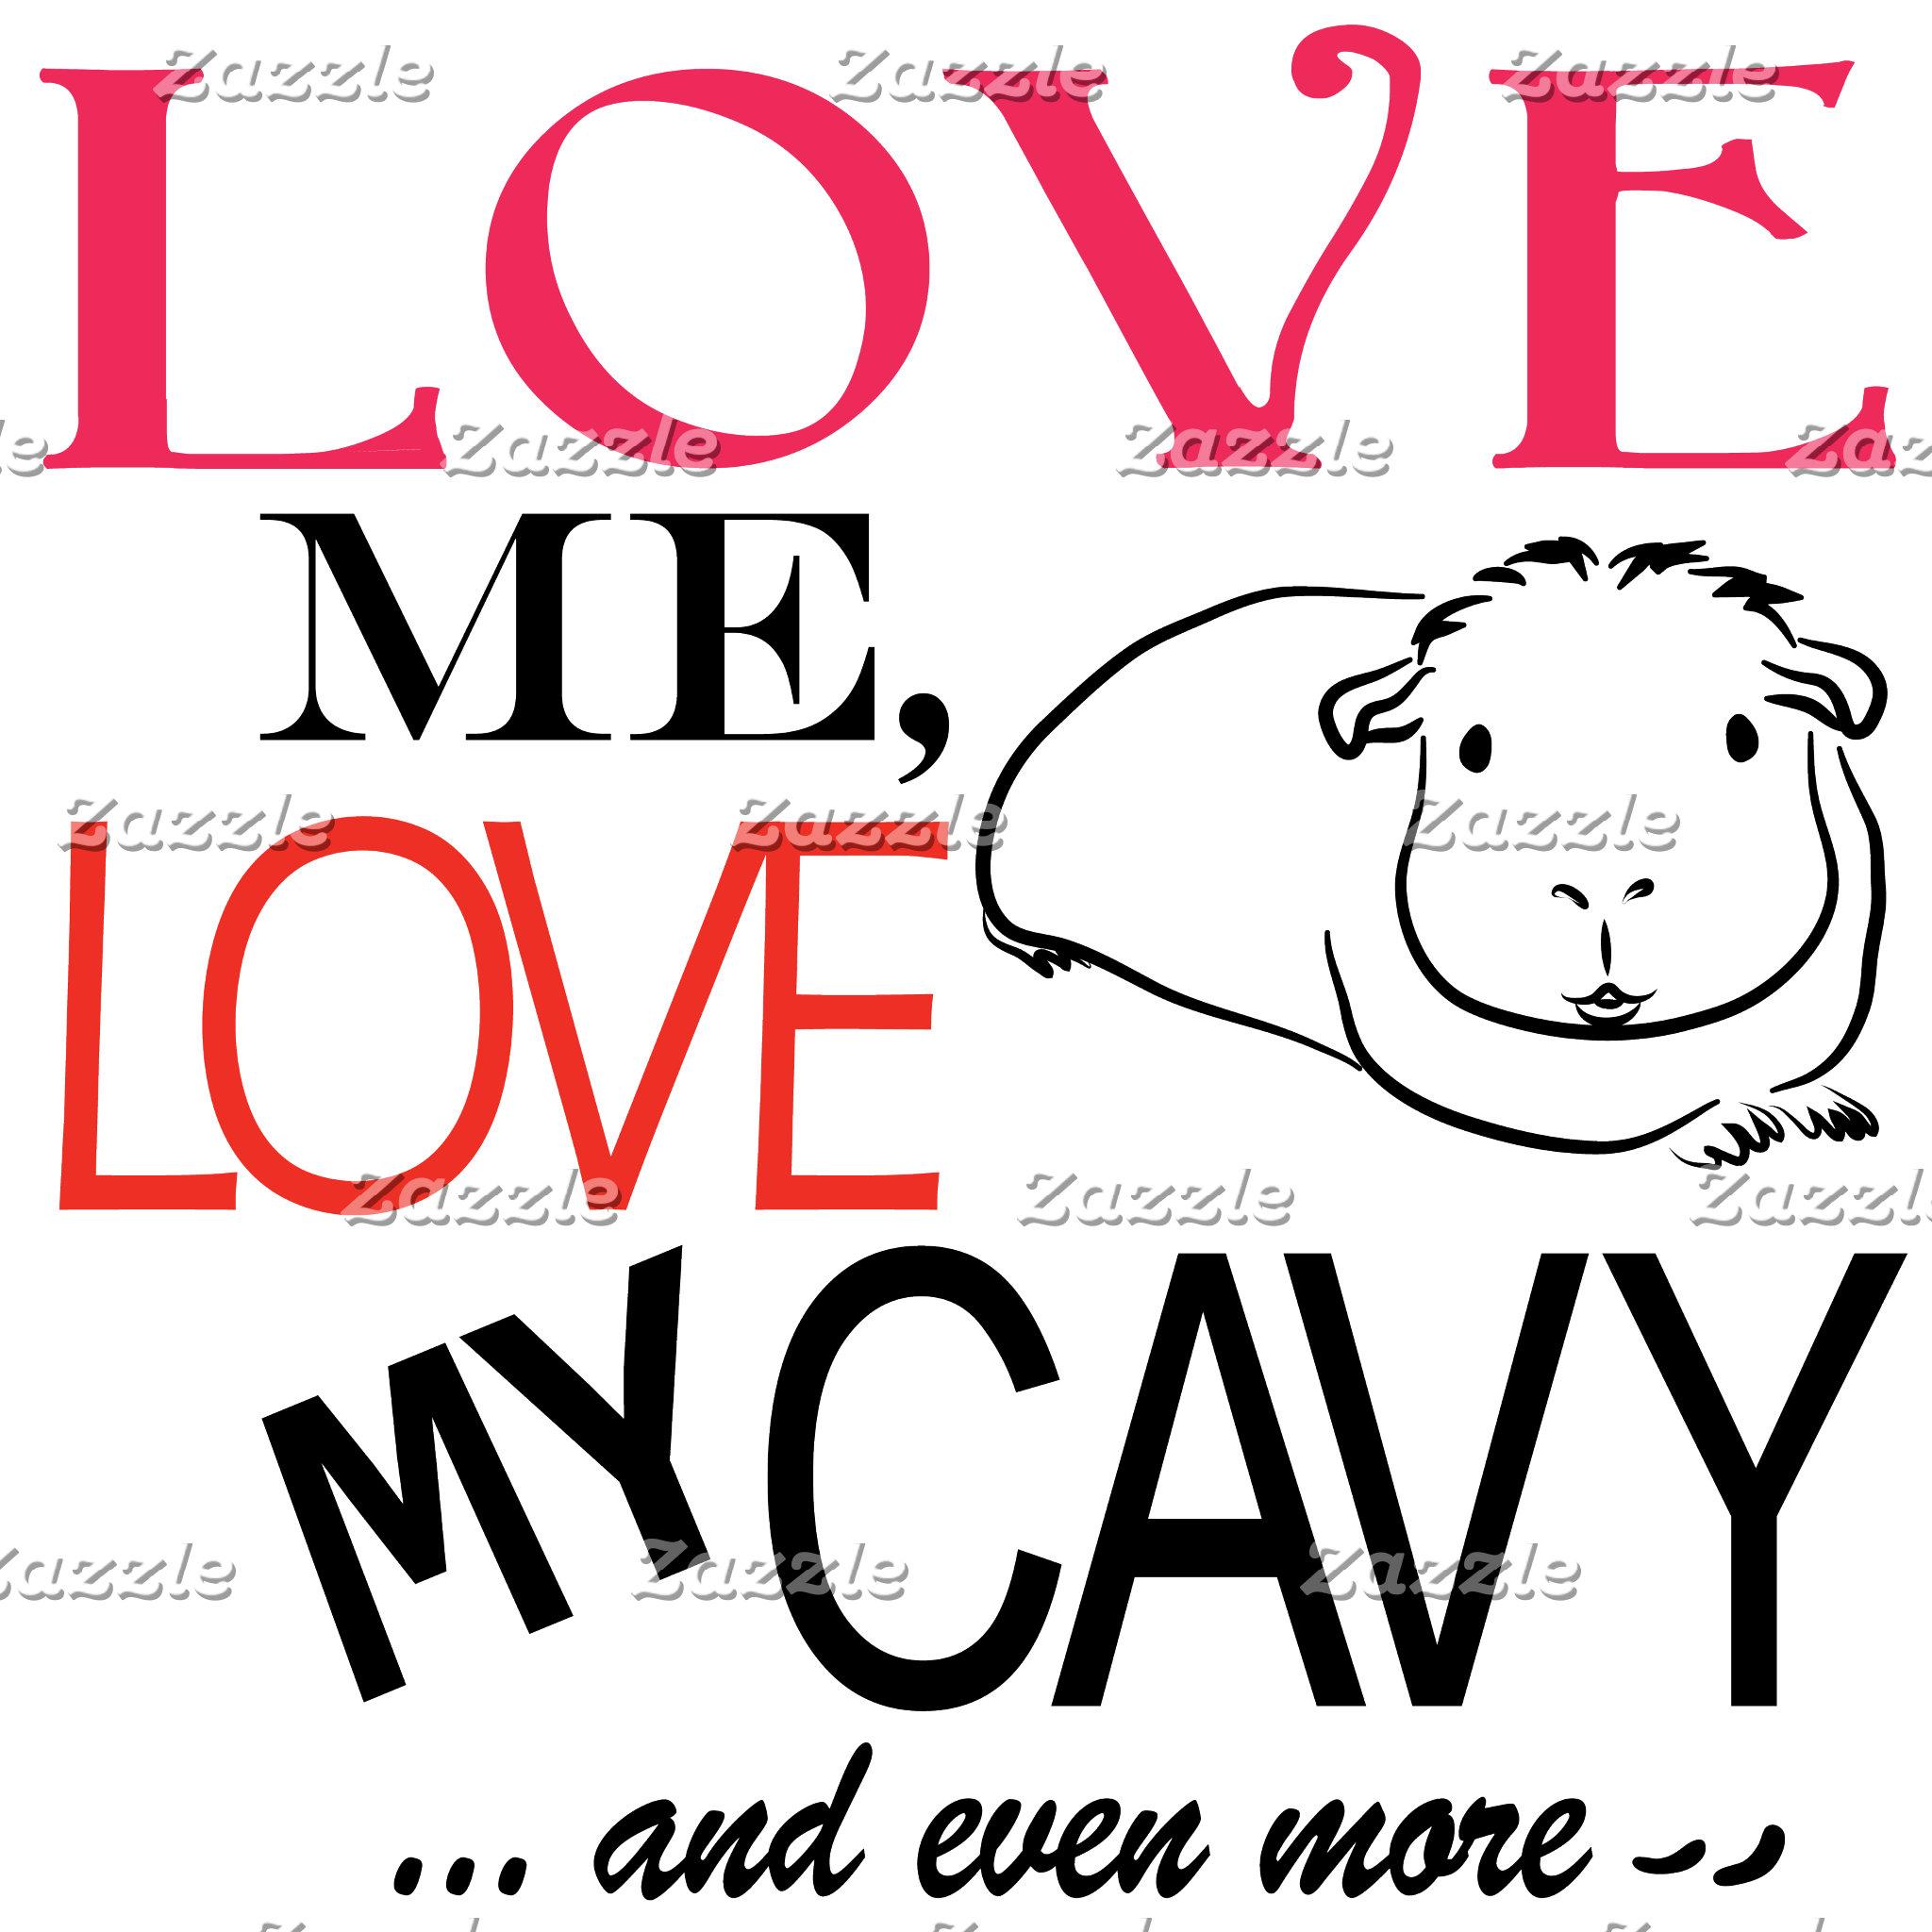 Love me, Love my cavy